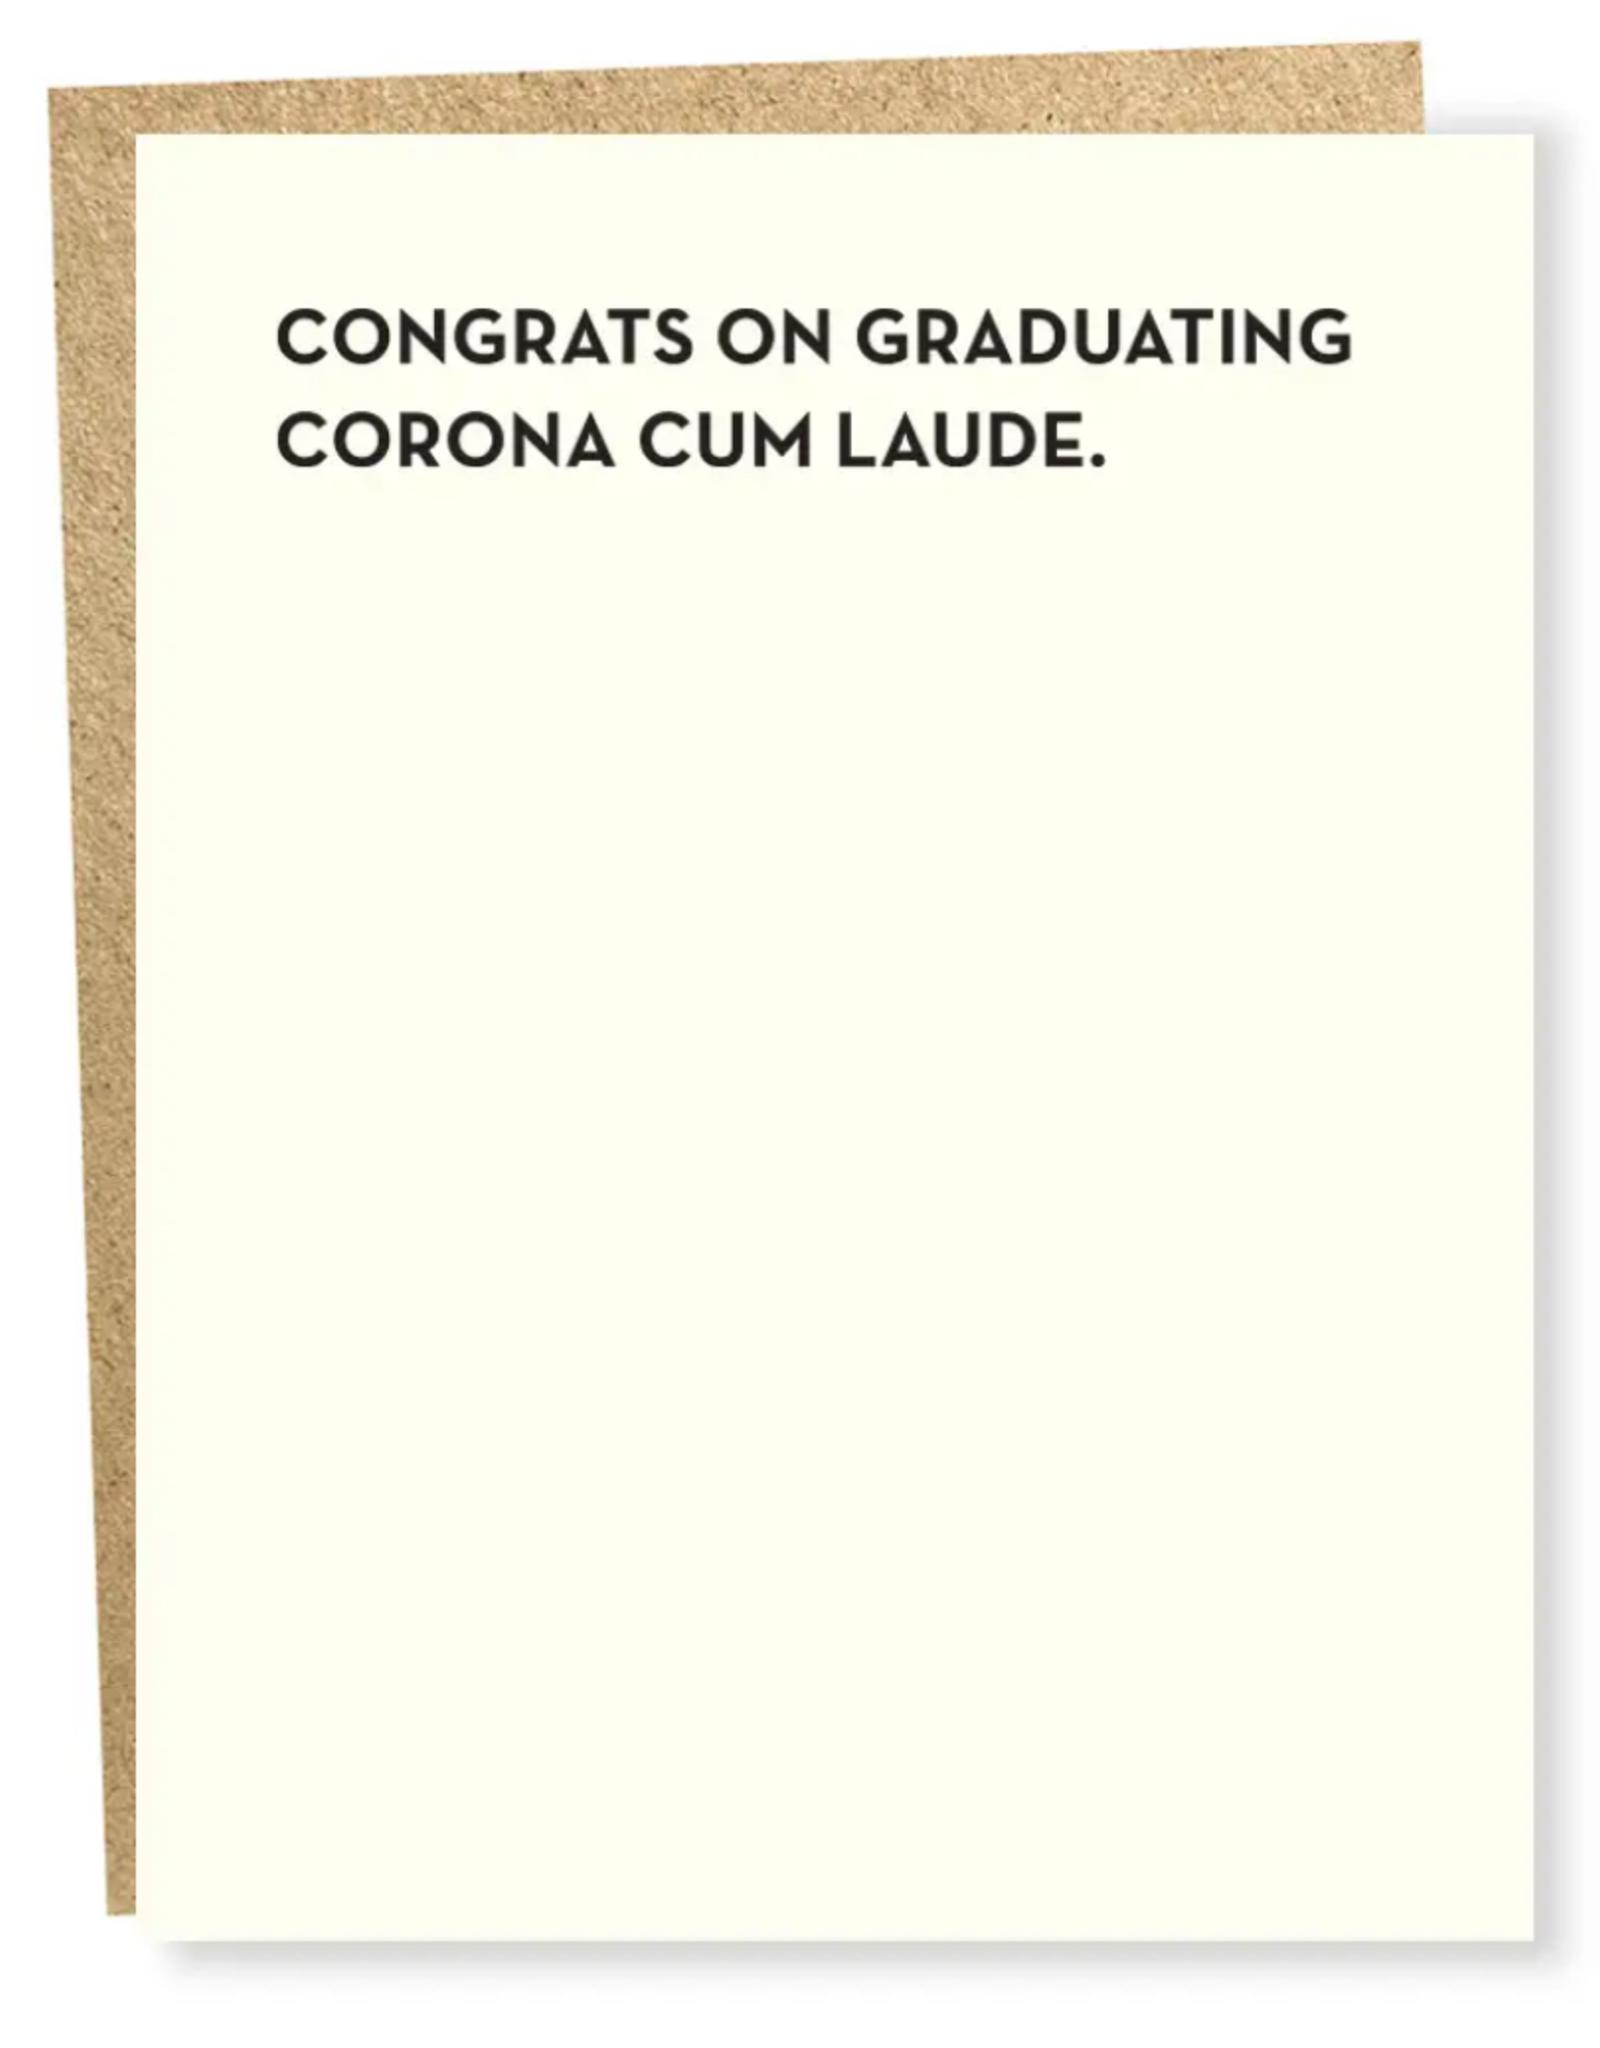 Sapling Press Sapling Press | Corona Cum Laude Card